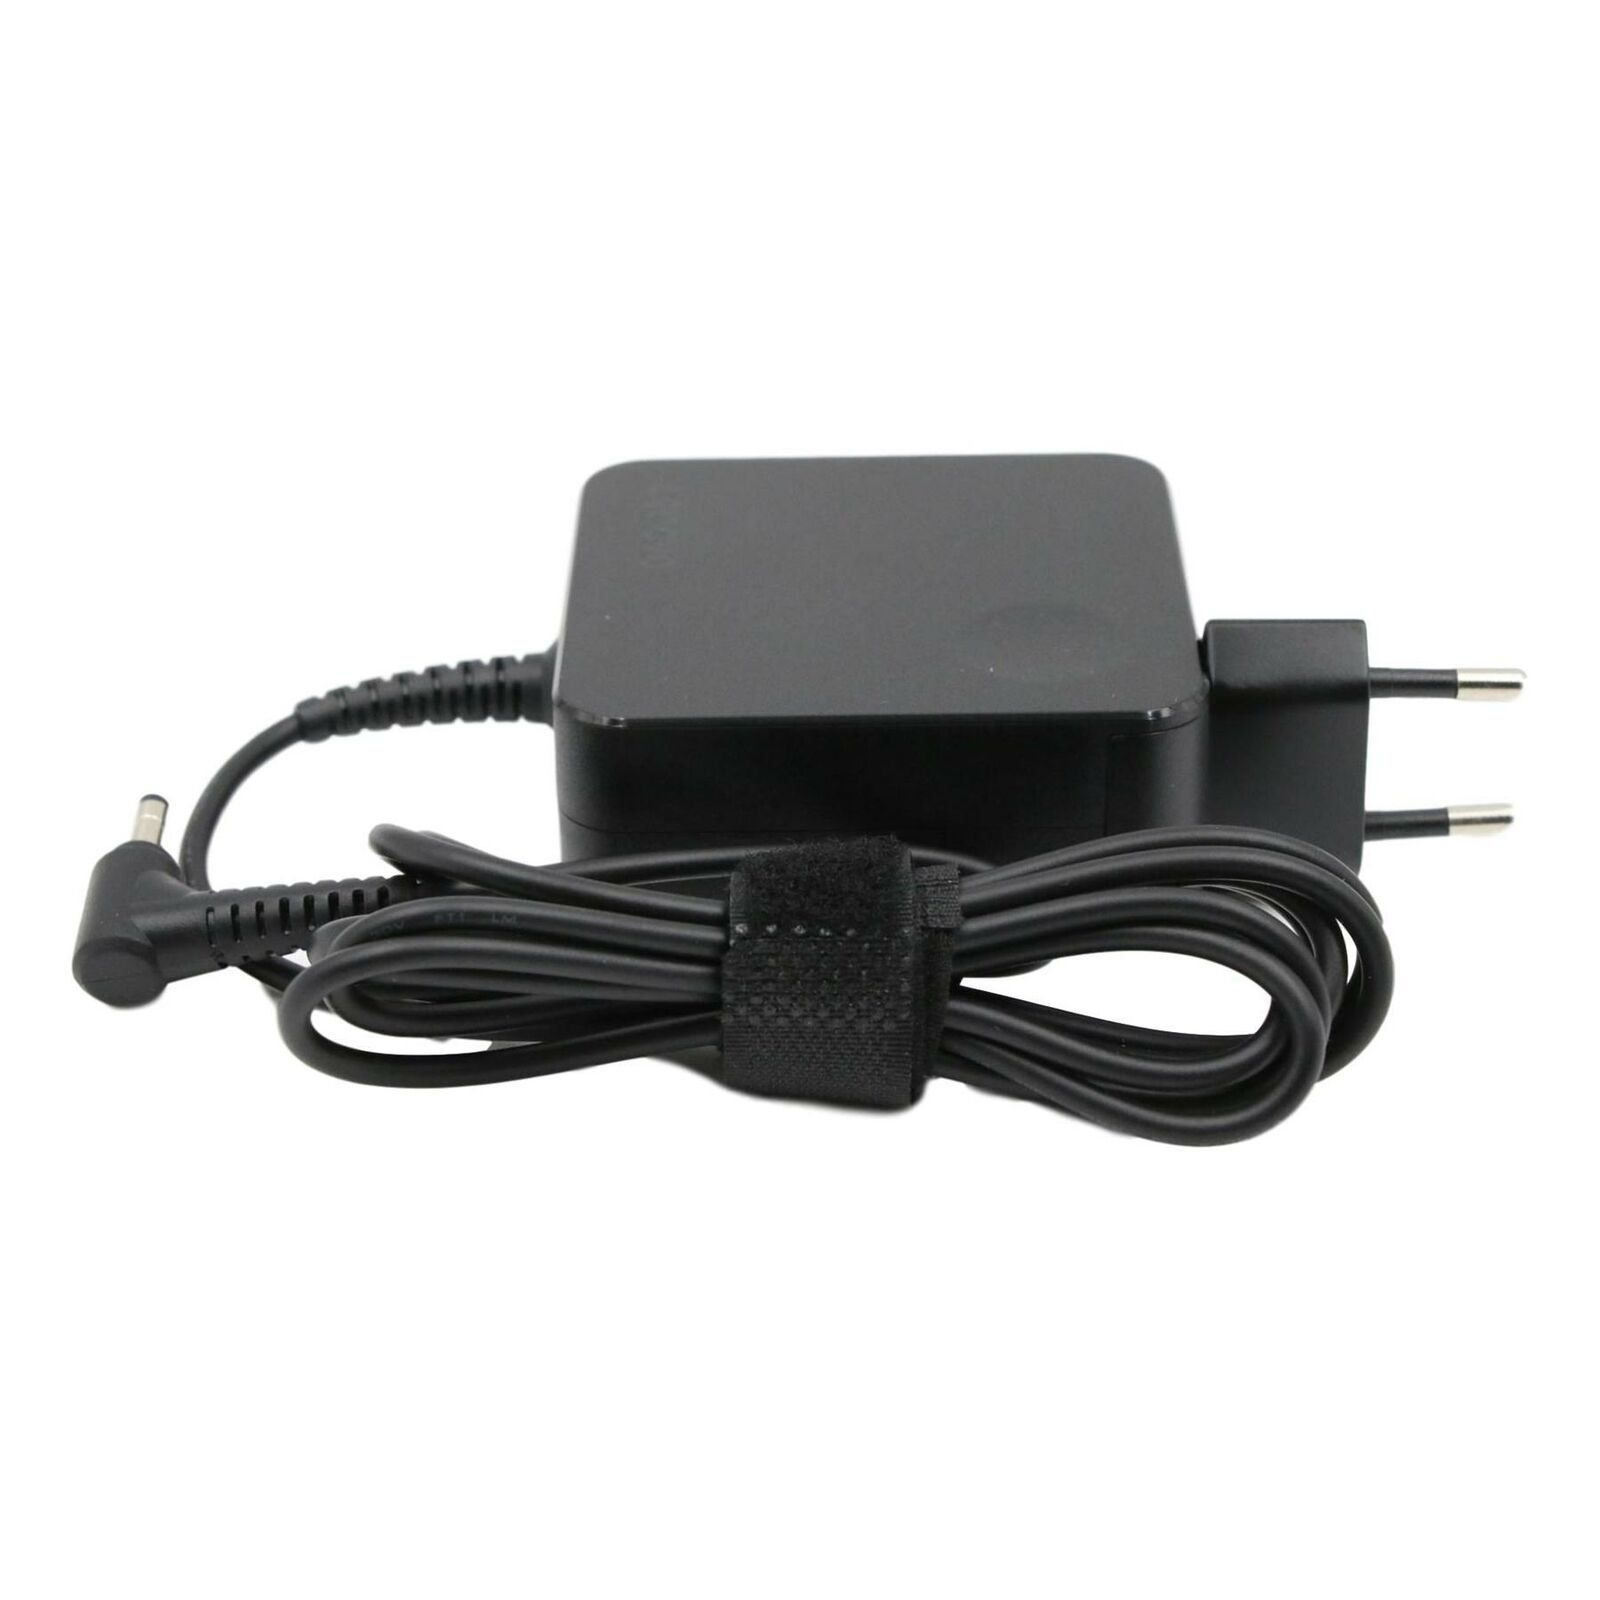 Sạc dành cho Lenovo IdeaPad 100-14IBD - Adapter Lenovo 100-14 IBD